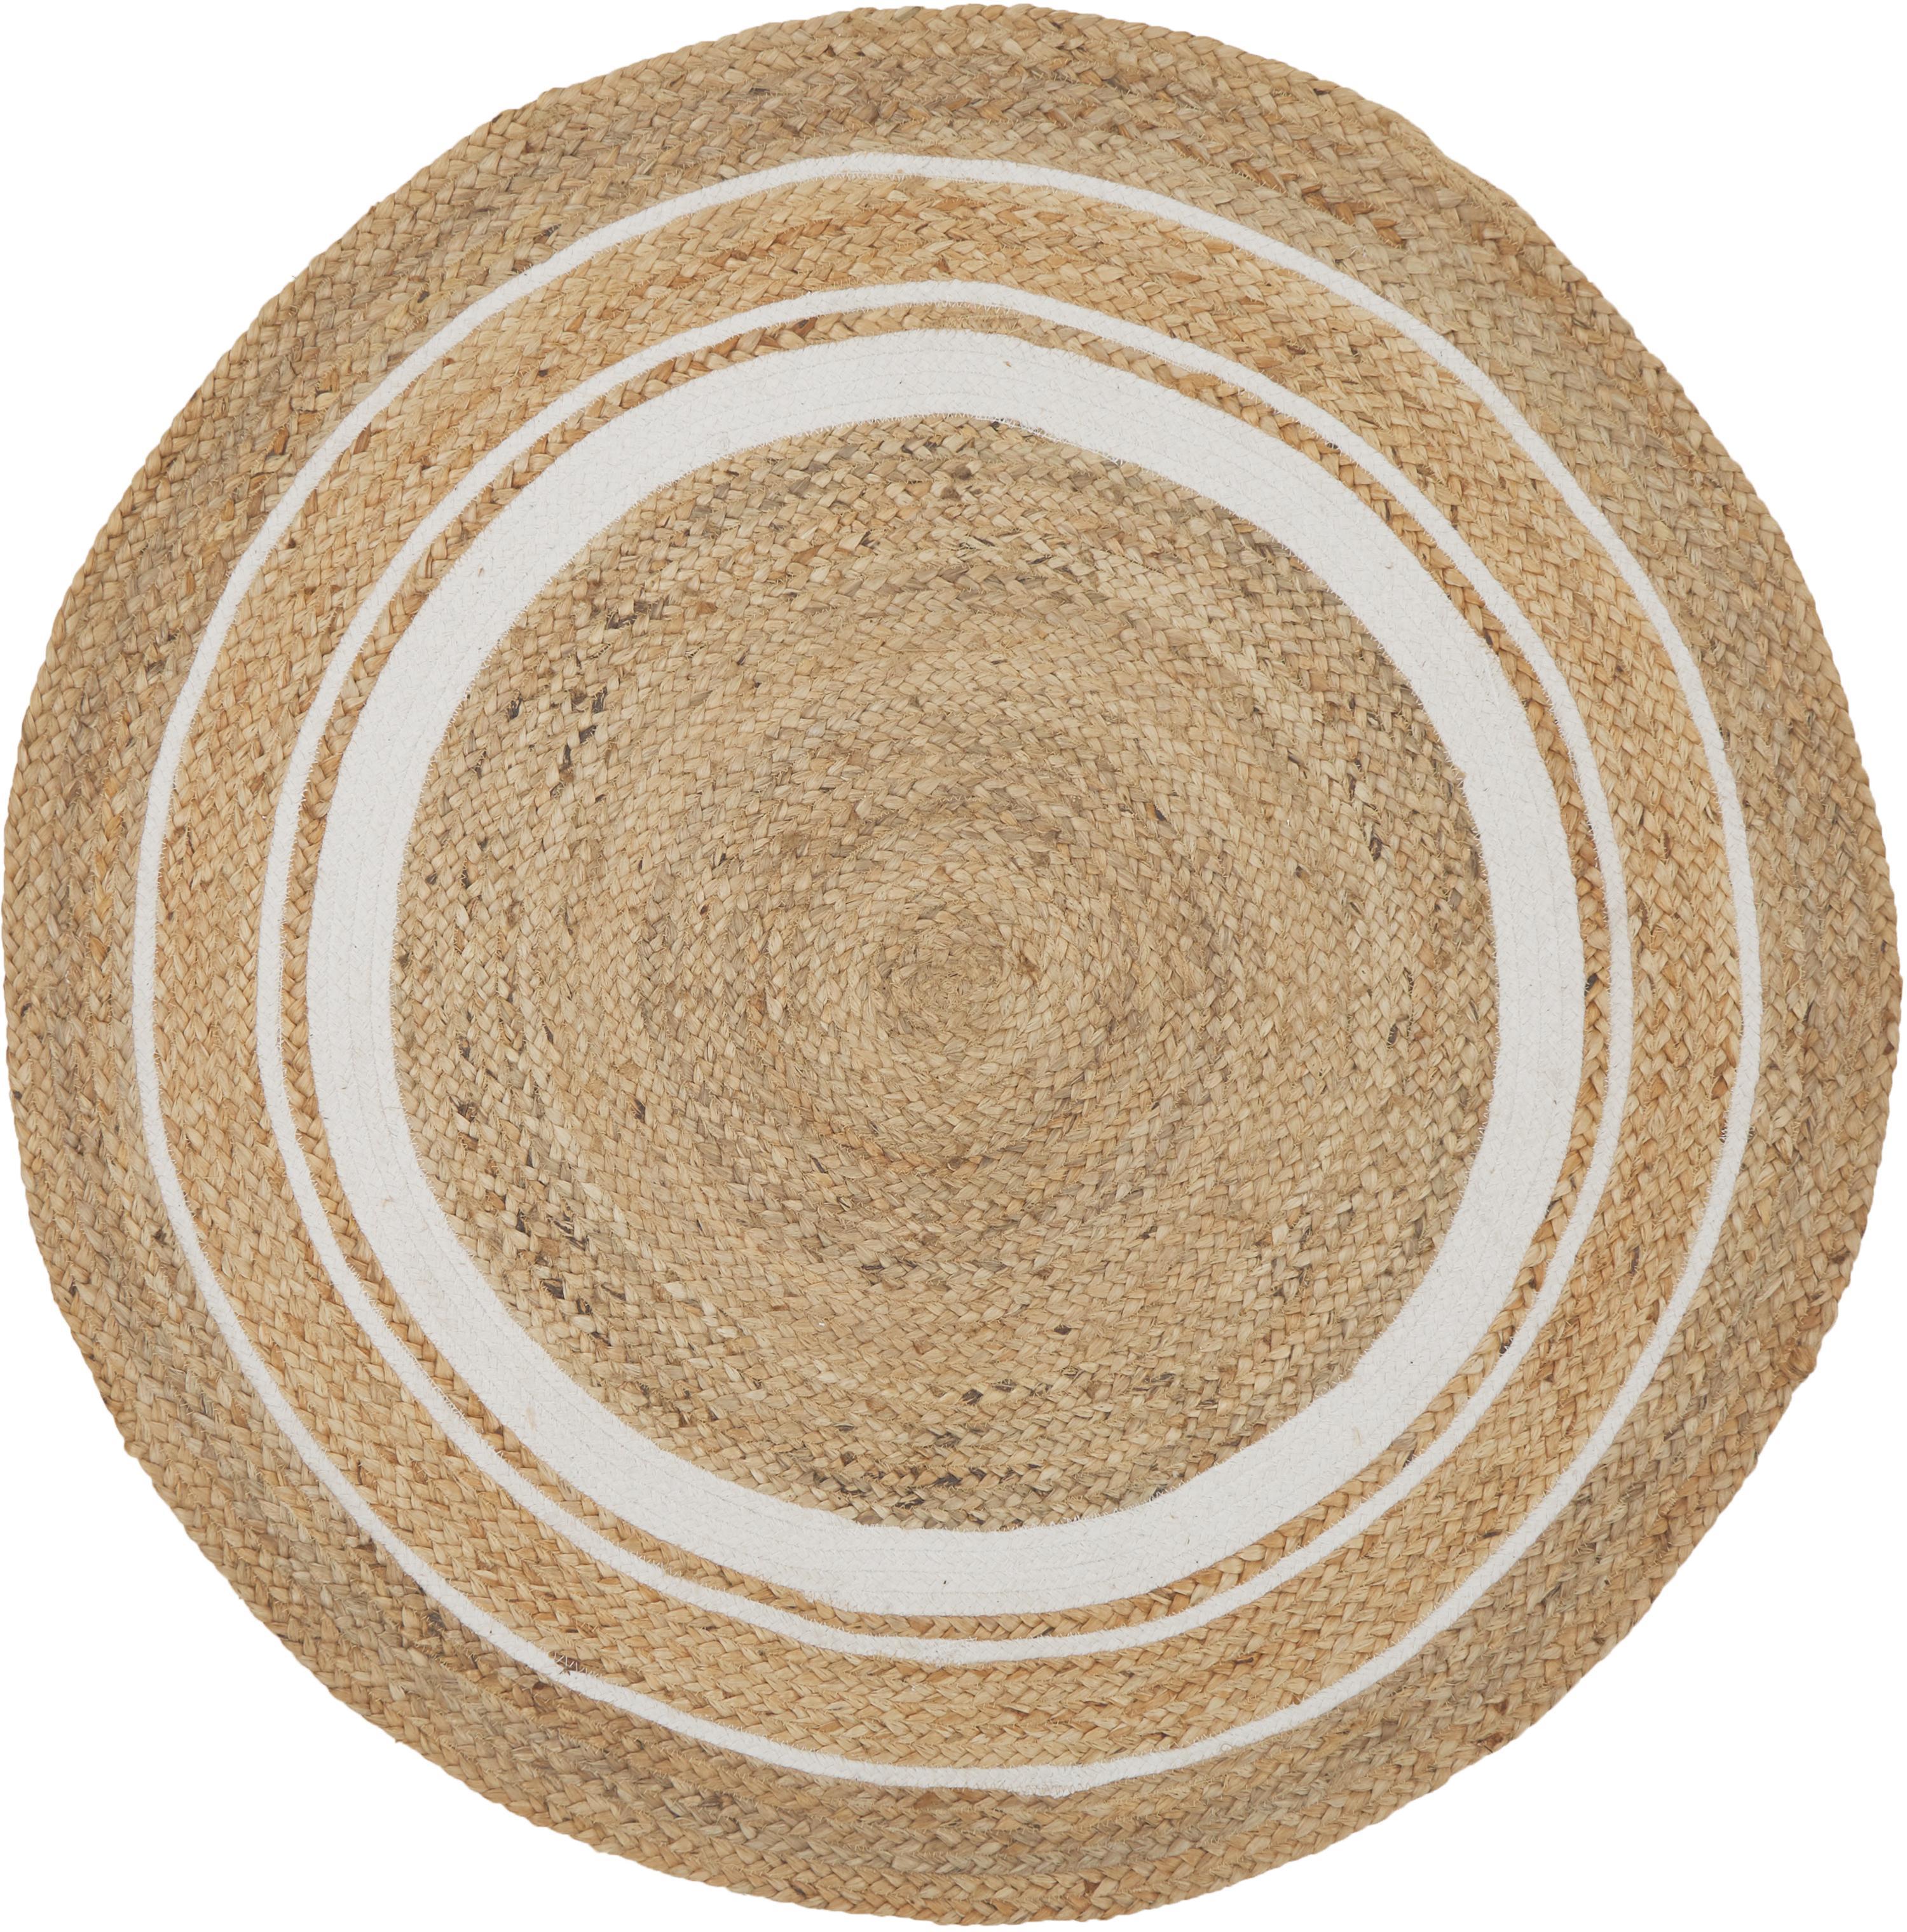 Alfombra artesanal de yute Clover, 75%yute, 24%algodón, 1%poliéster, Beige, blanco, Ø 120 cm (Tamaño S)